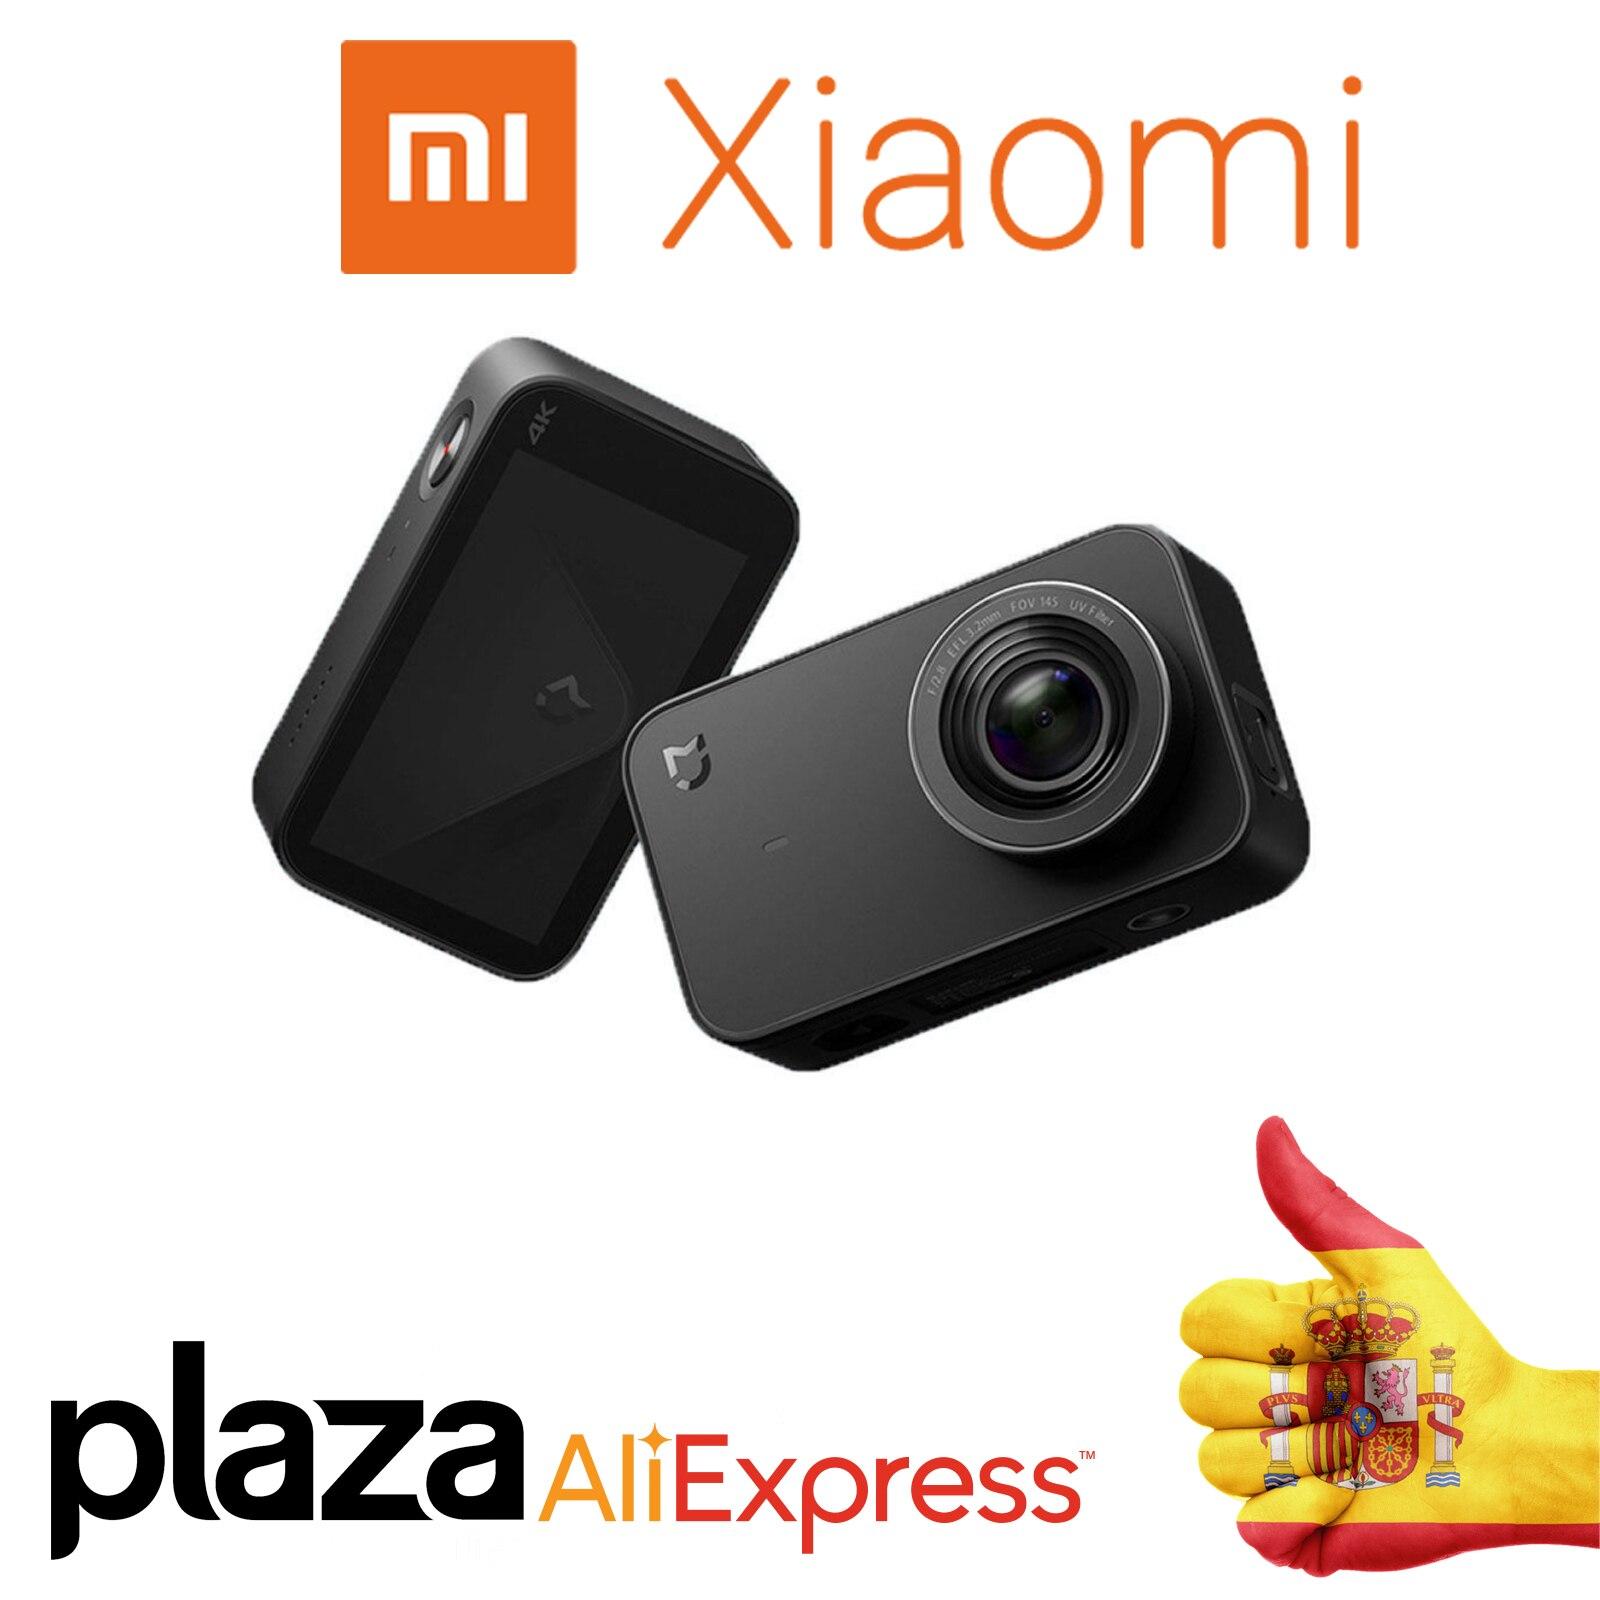 Xiaomi MiJia mini caméra d'action 4K vidéo 2.4